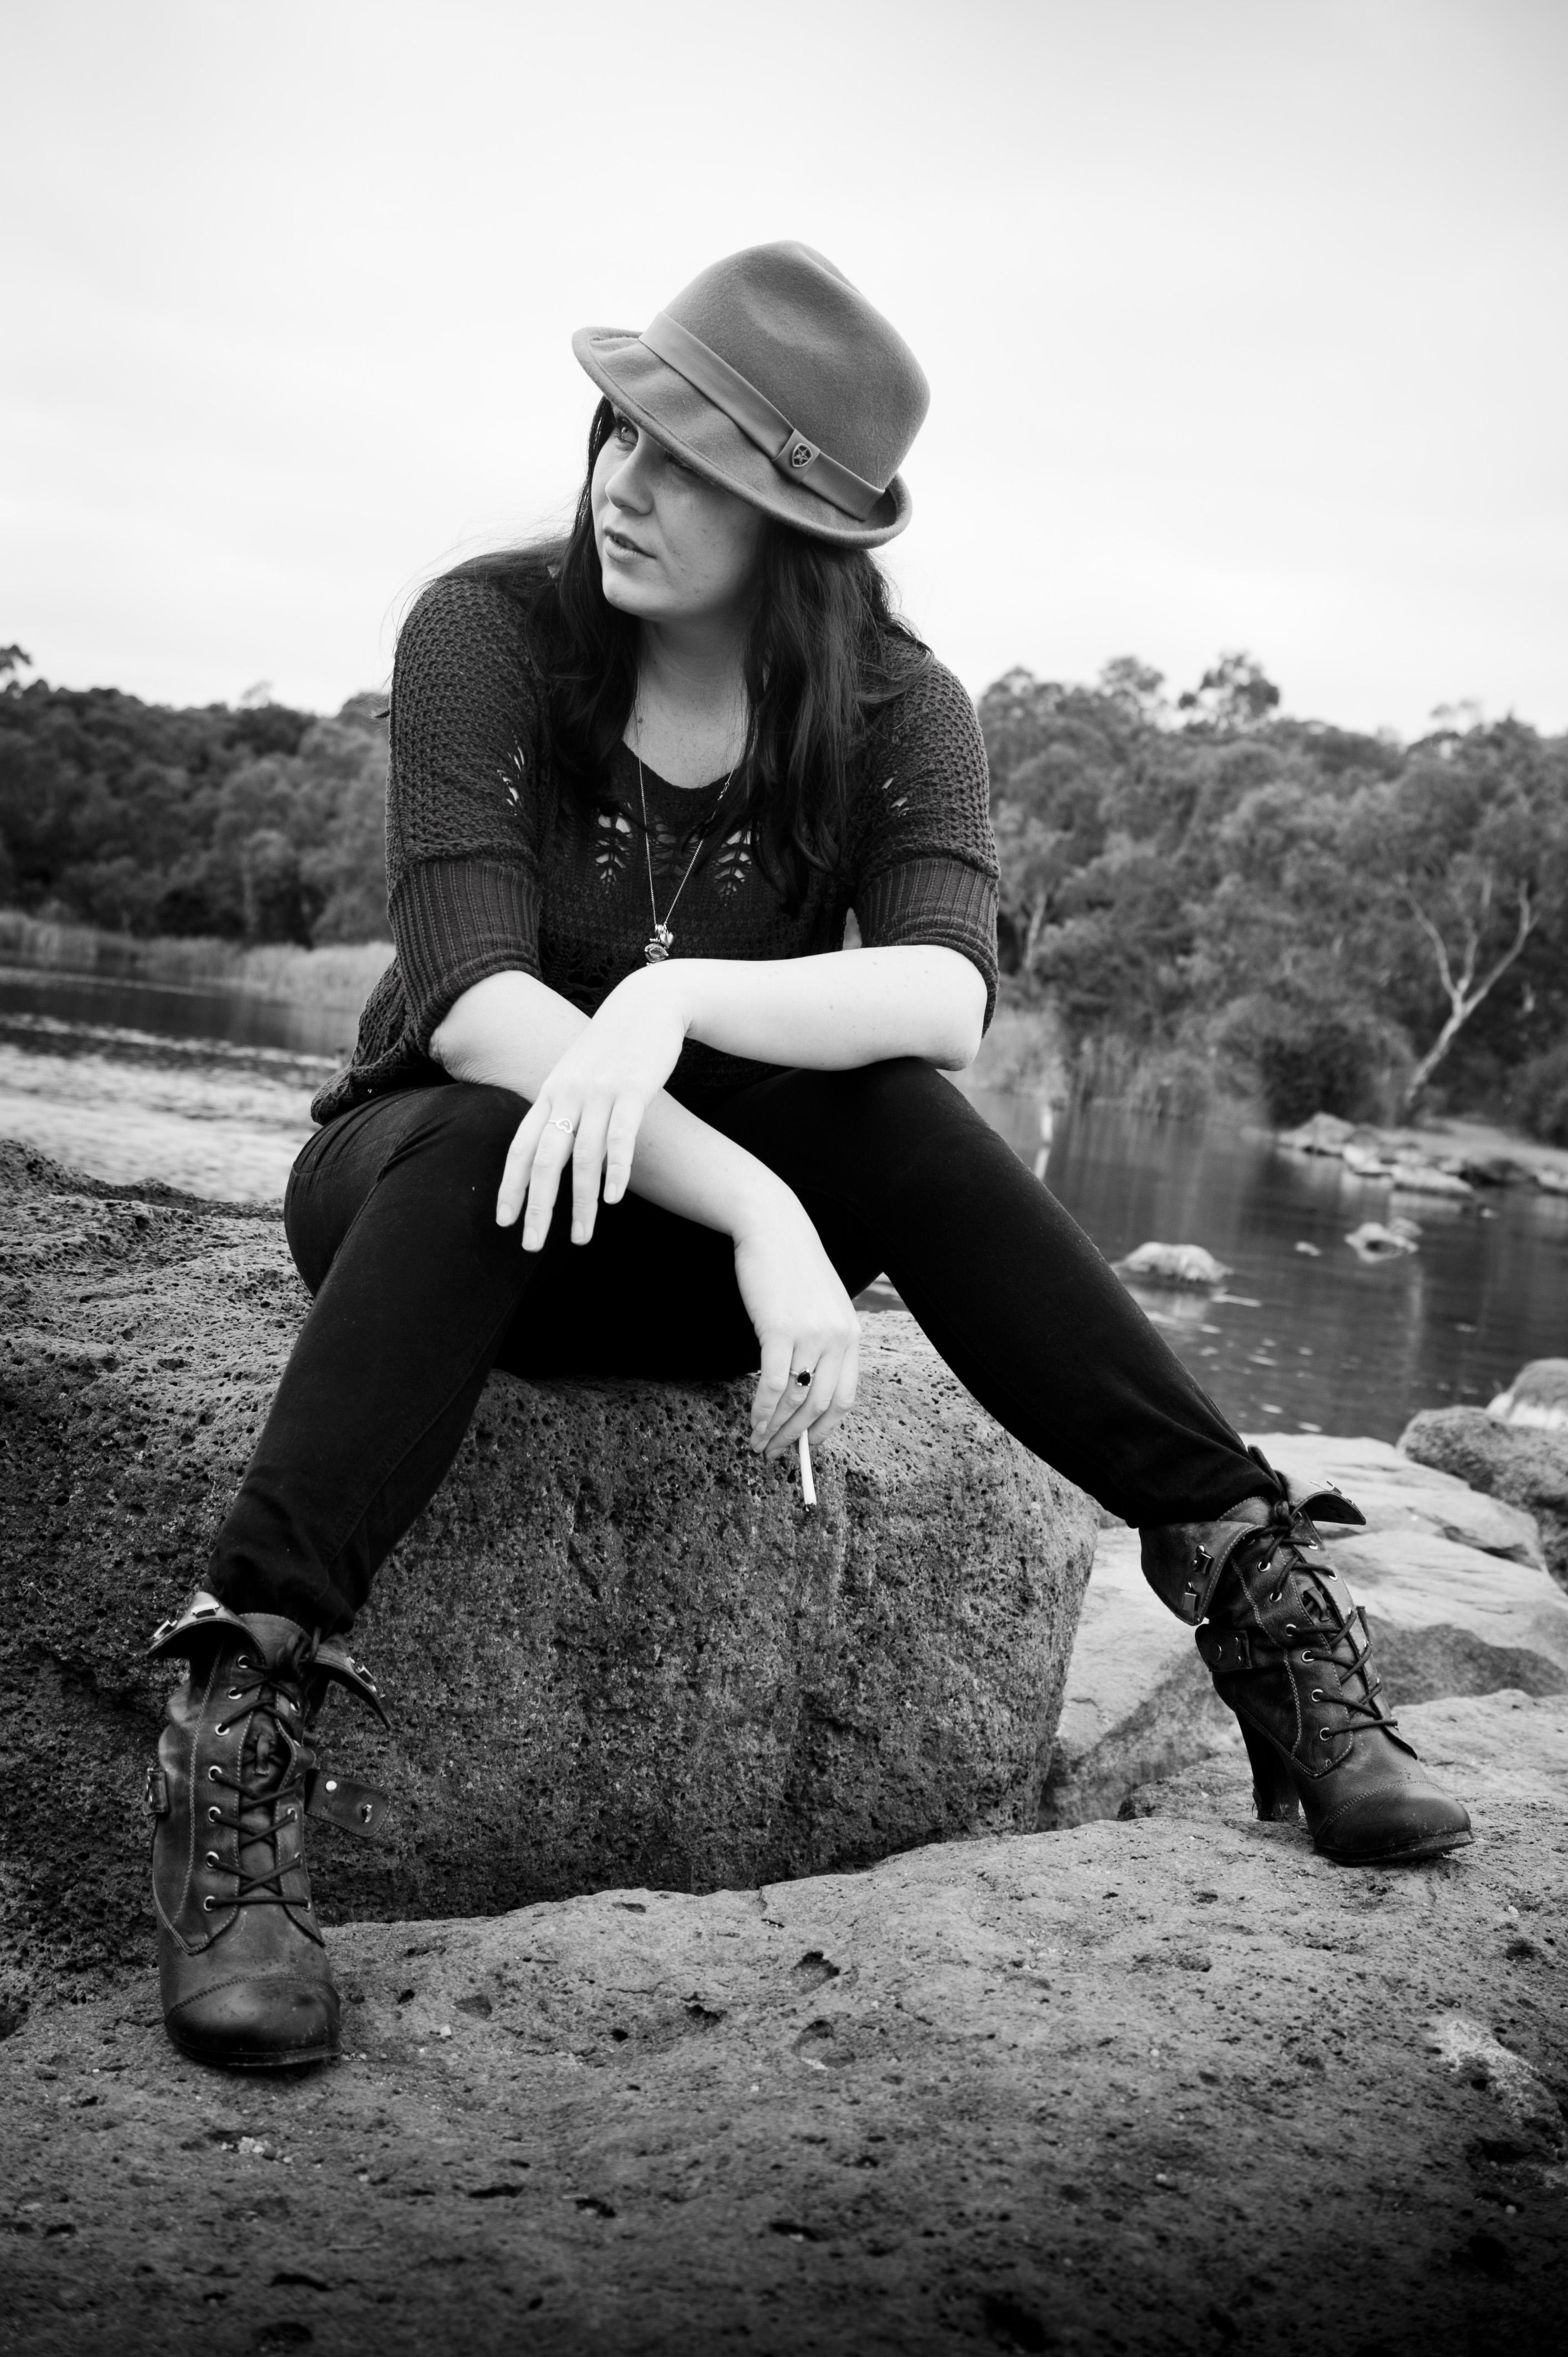 Photographer: Tammy Lee Baird